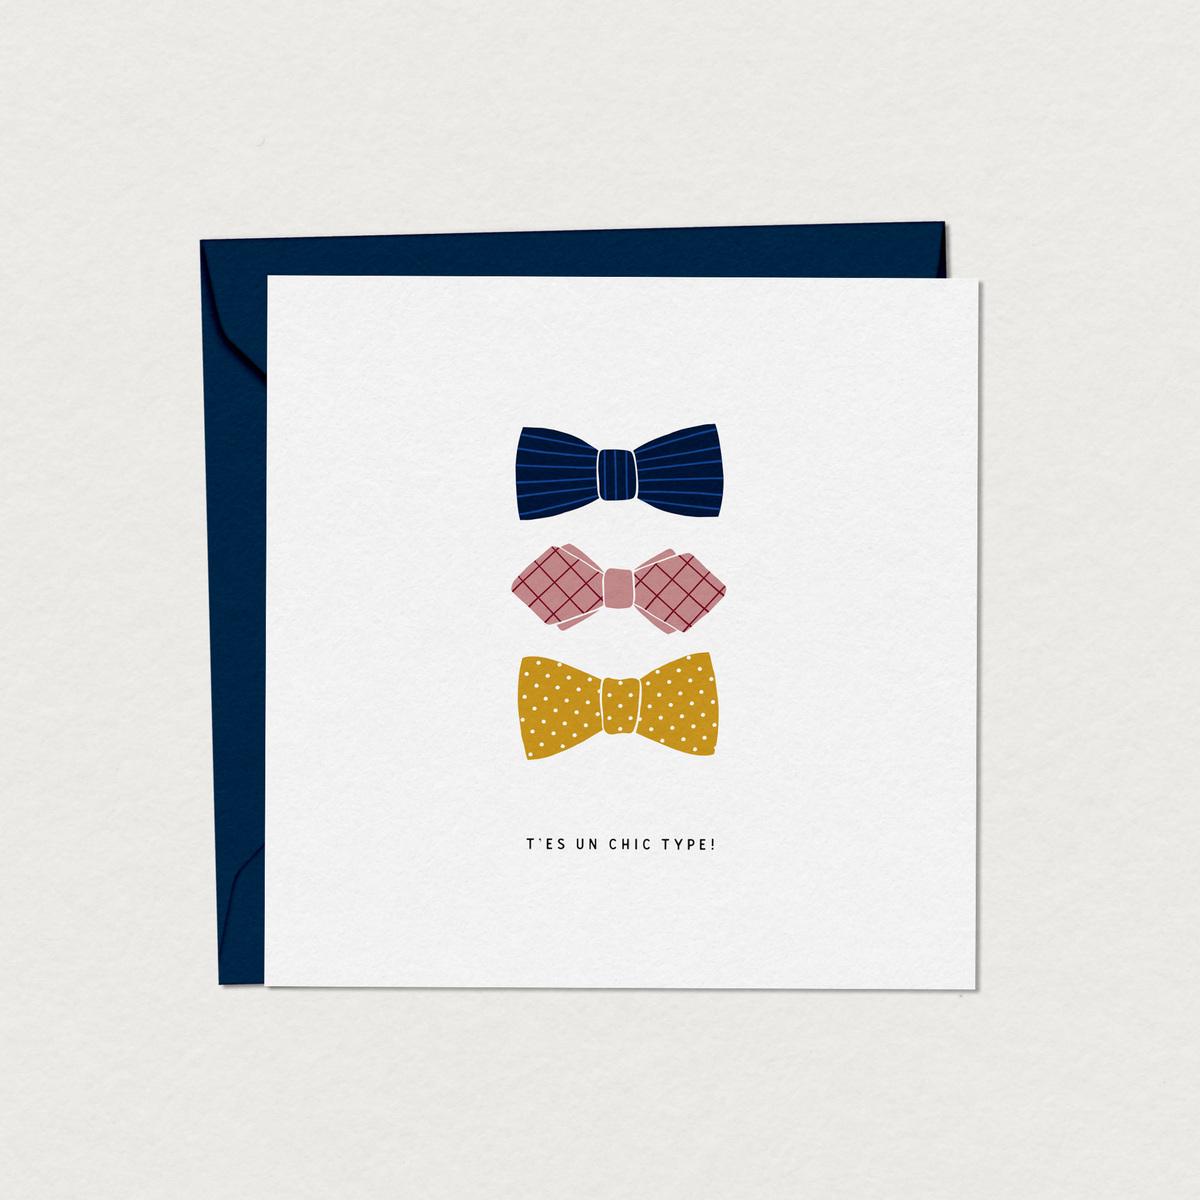 mfa -- designer textile - noeuds pap